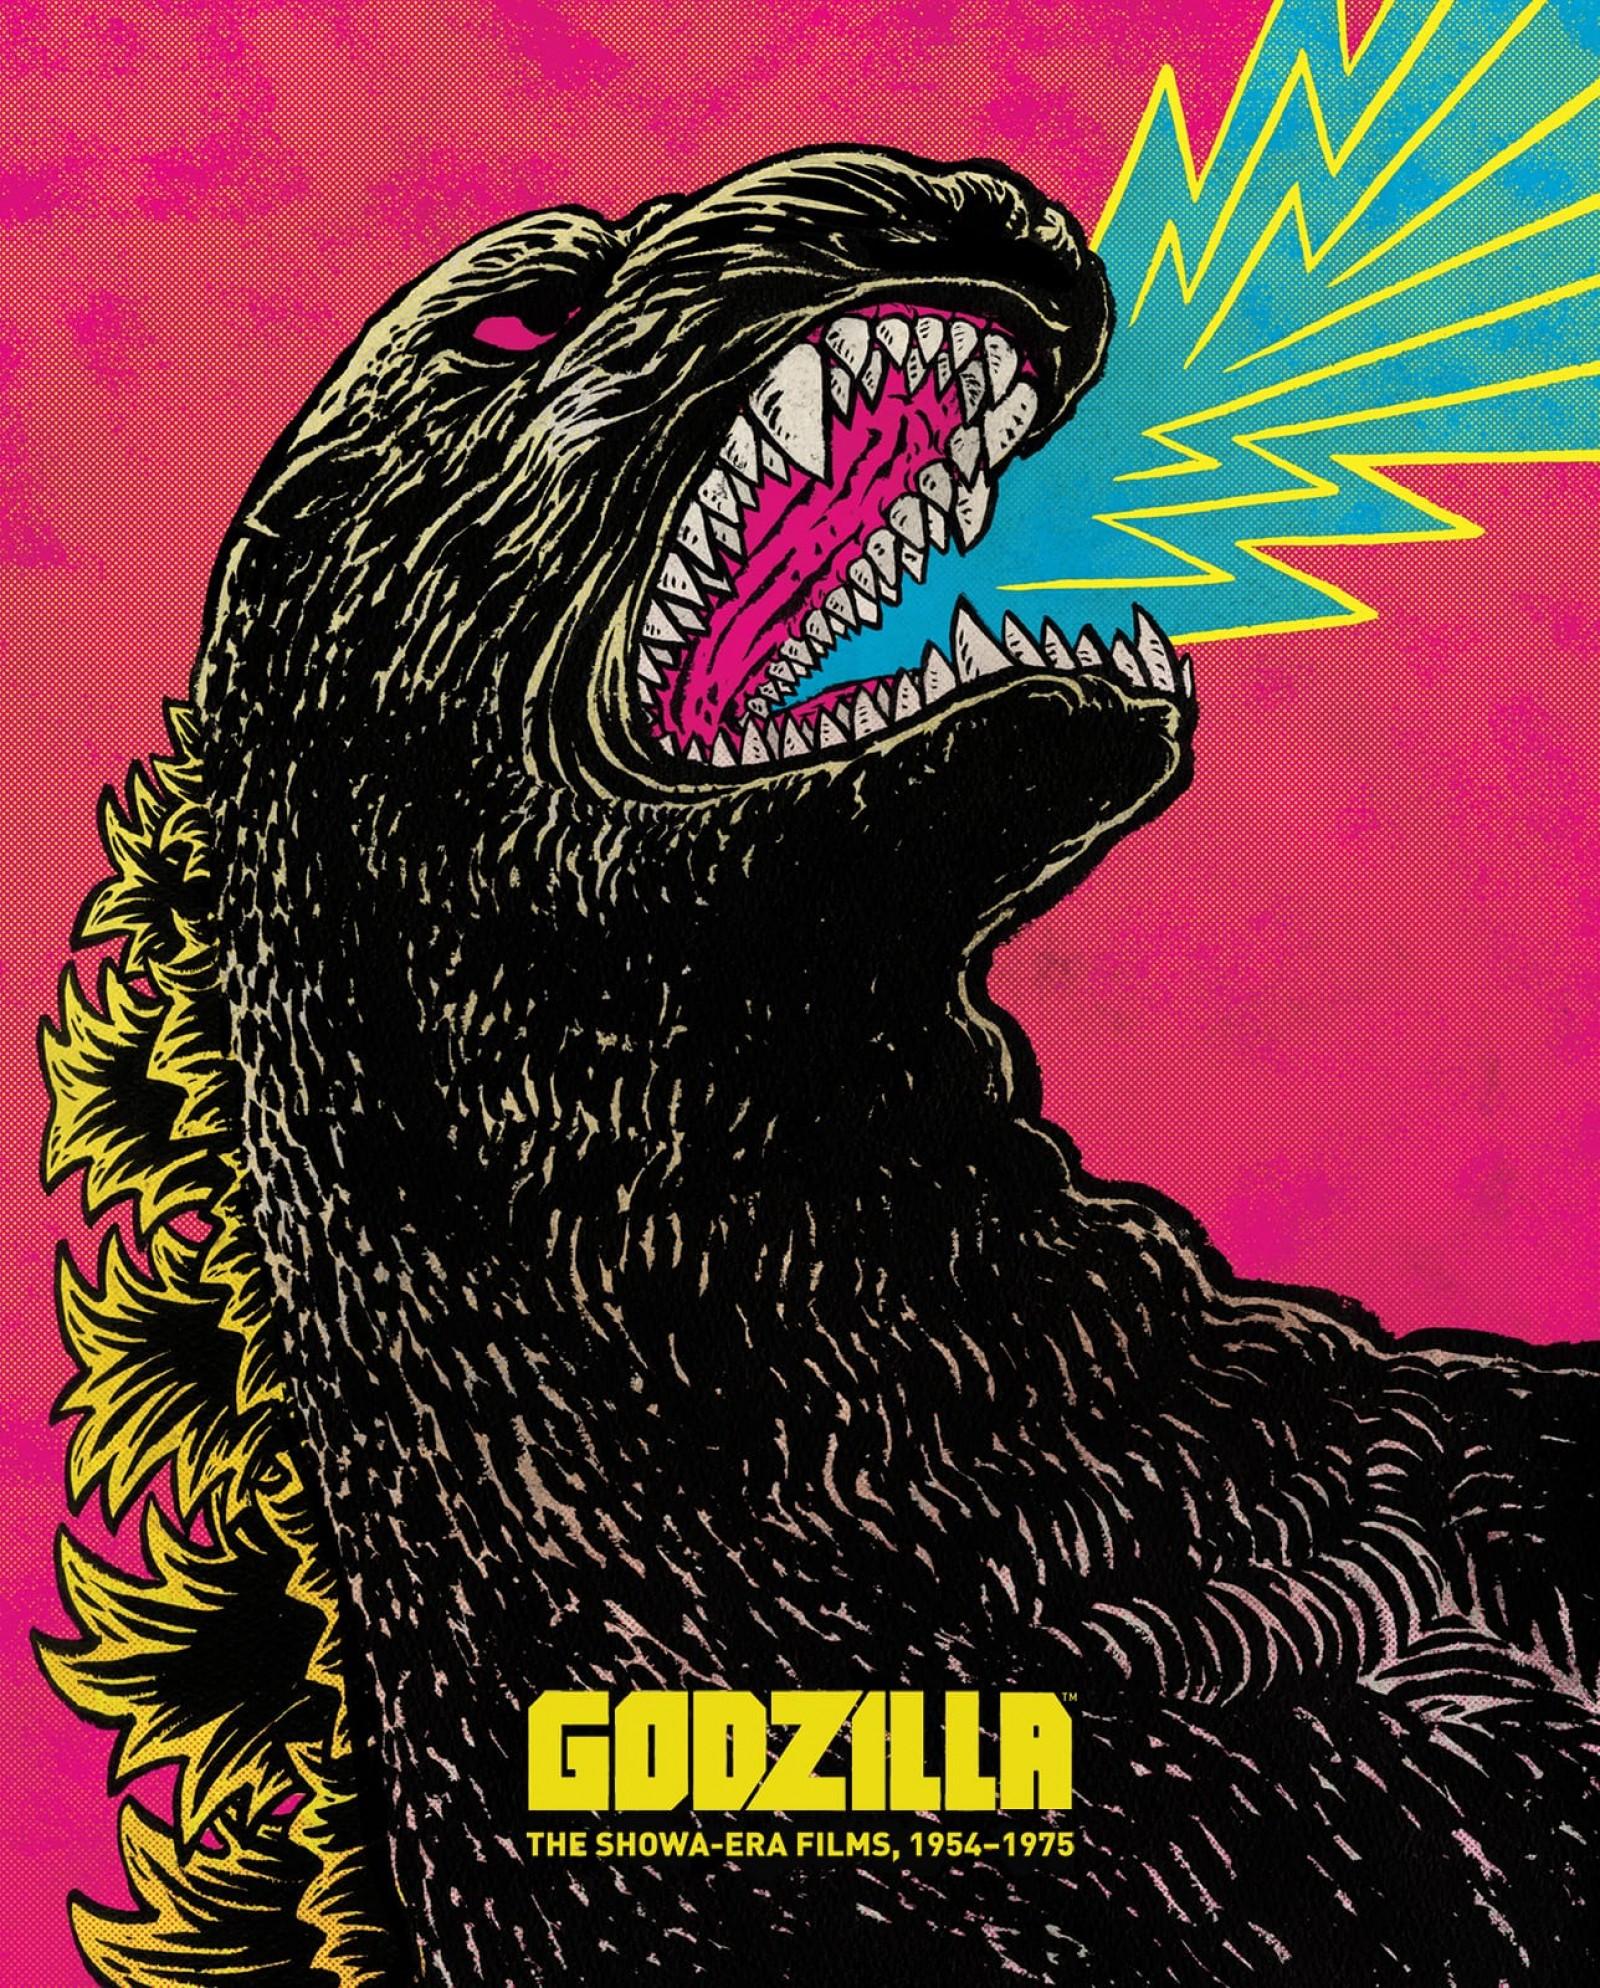 Shadows Of Evil Train Symbols : shadows, train, symbols, Blu-ray, Review:, Criterion's, Godzilla:, Showa-Era, Films, 1954-1975, Slant, Magazine